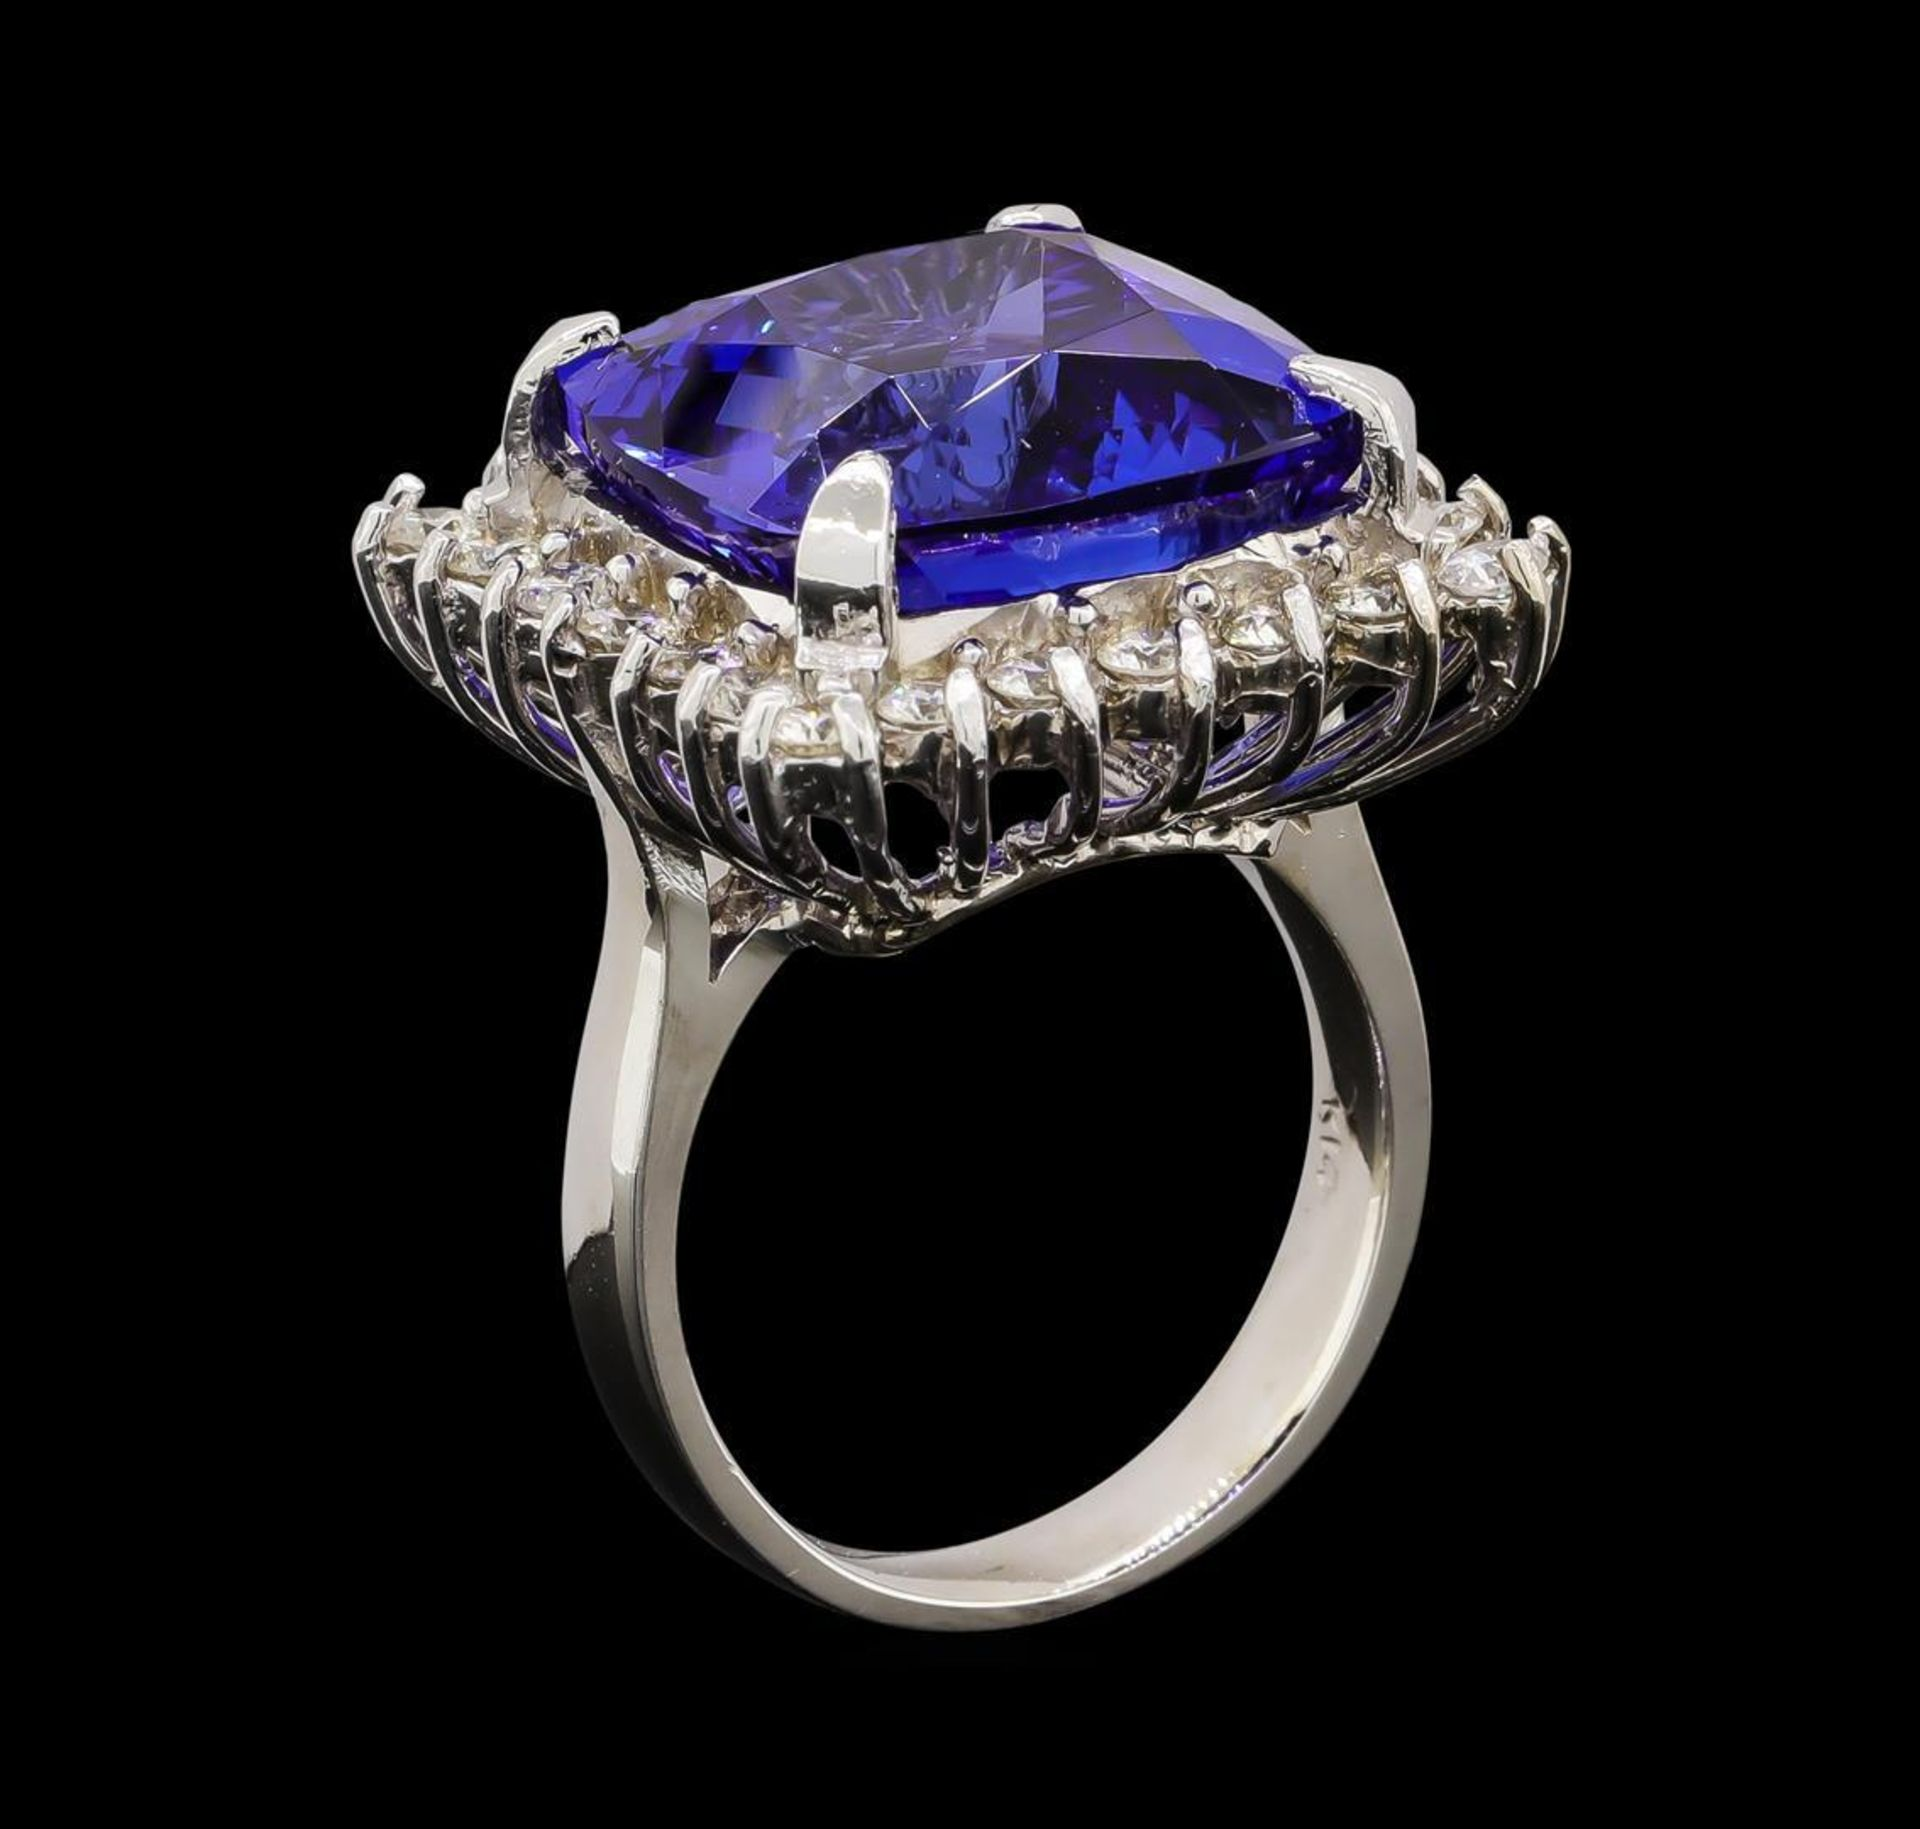 GIA Cert 17.69 ctw Tanzanite and Diamond Ring - 14KT White Gold - Image 4 of 6